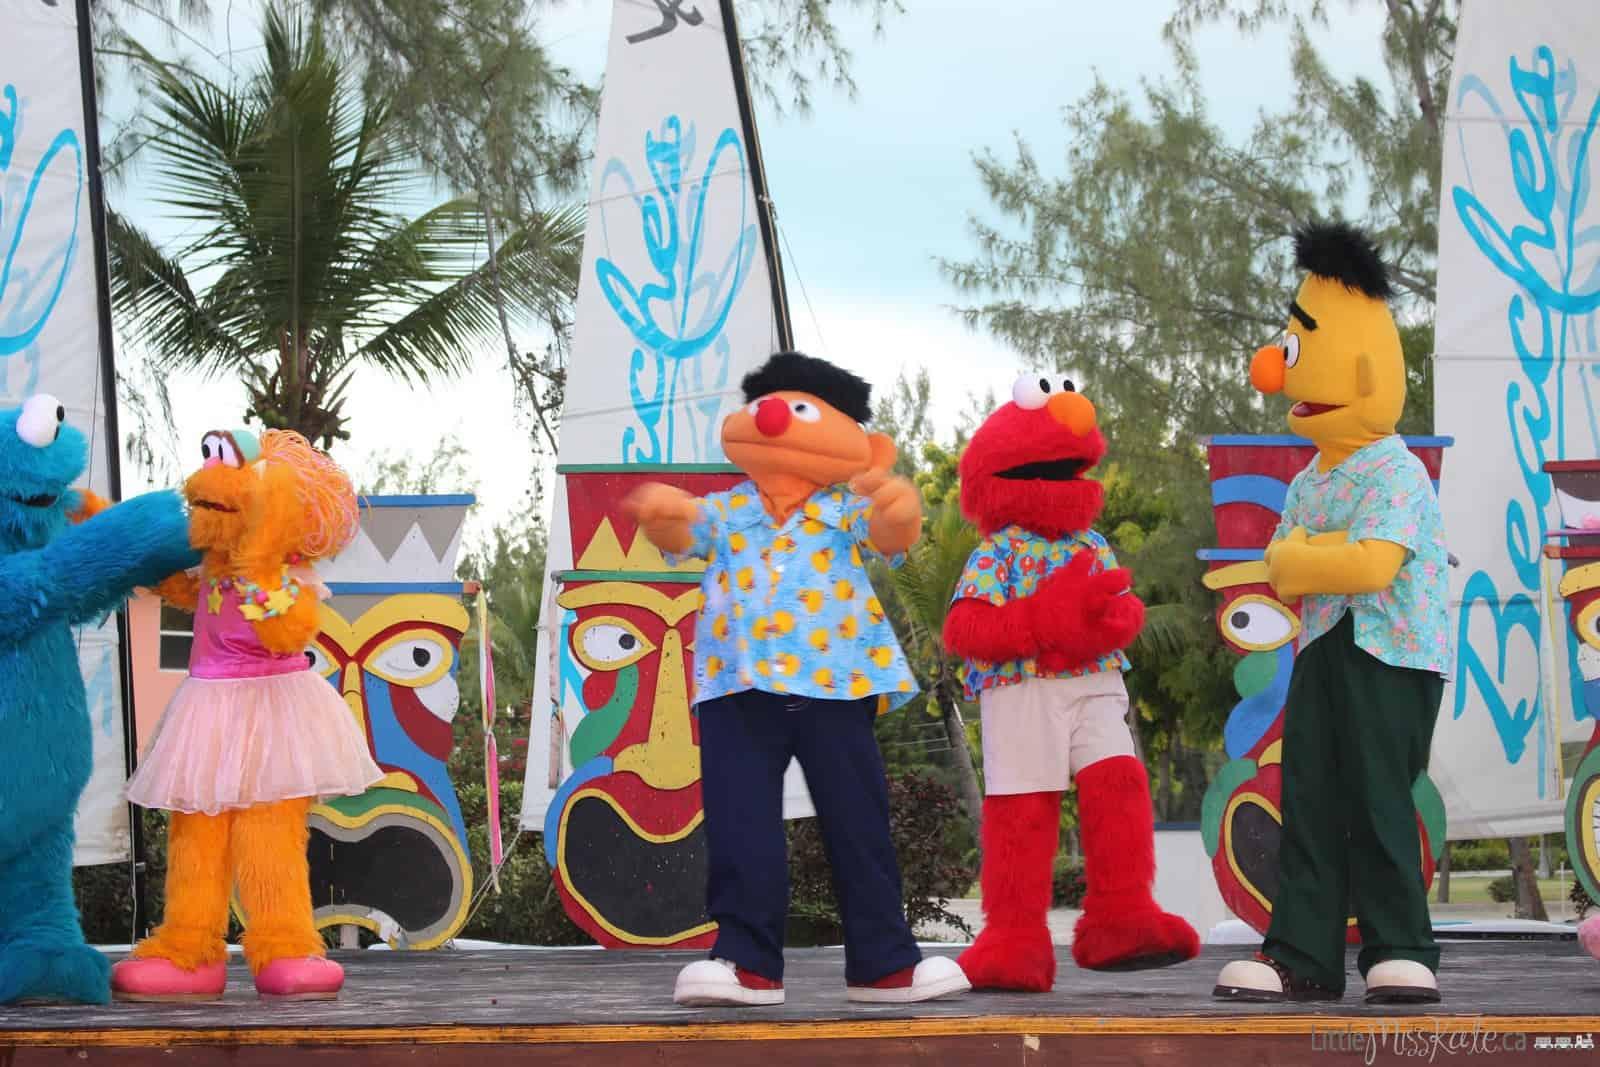 Beaches Resort Turks and Caicos Sesame Street Entertainment Shows via www.littlemisskate.ca